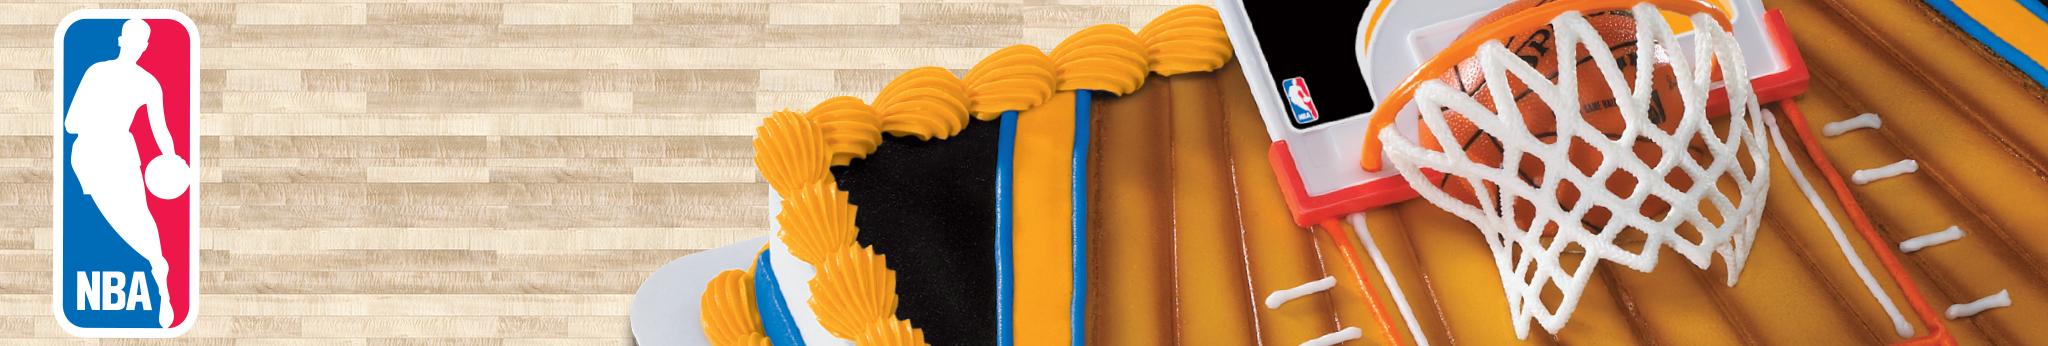 NBA Cake Decorations